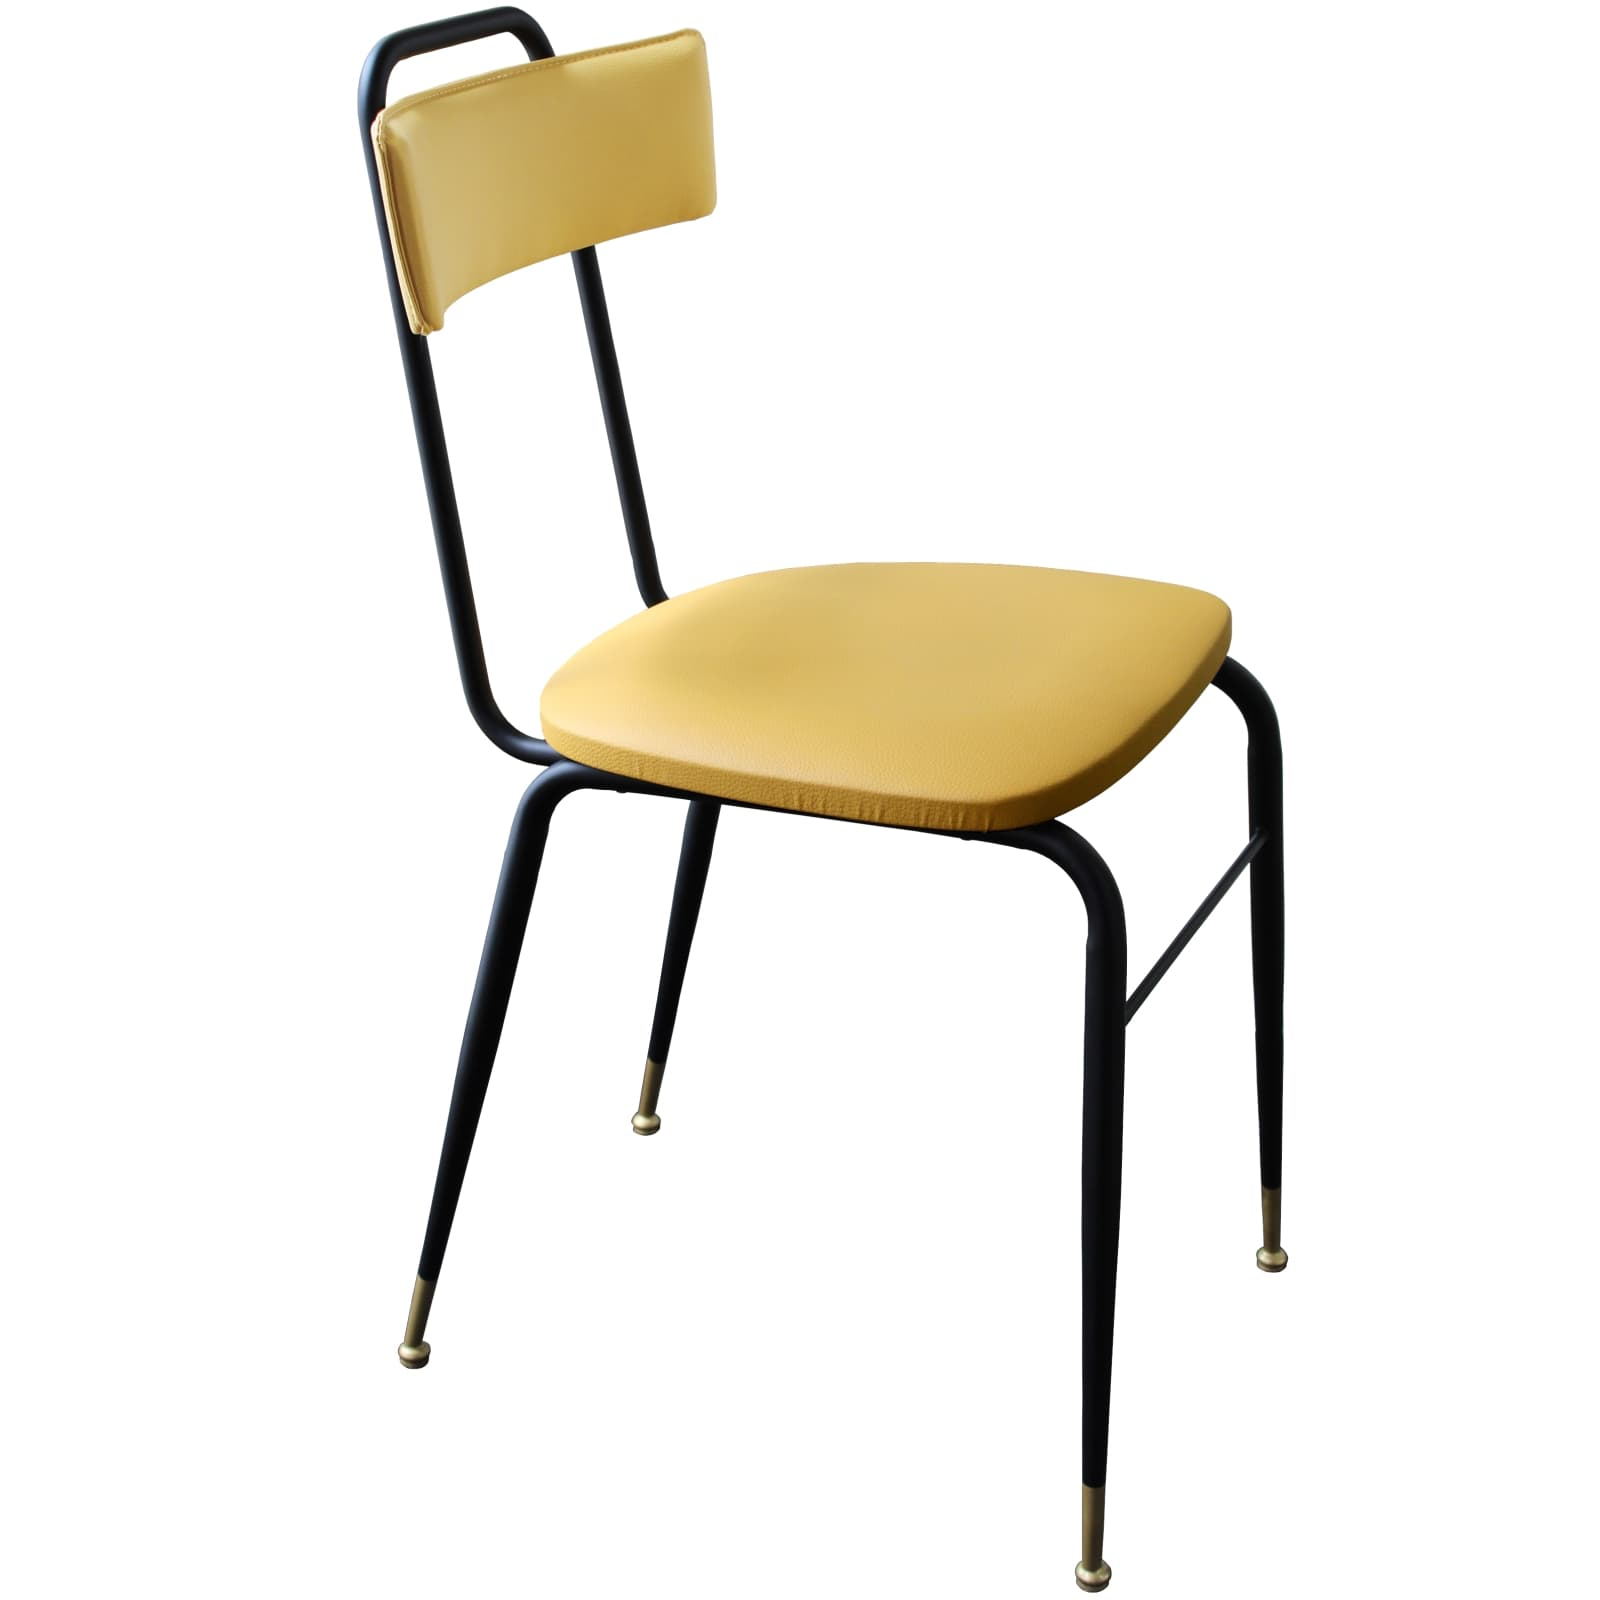 Sedia in Ecopelle senape stile Vintage con gambe in Metallo nero – CLOE